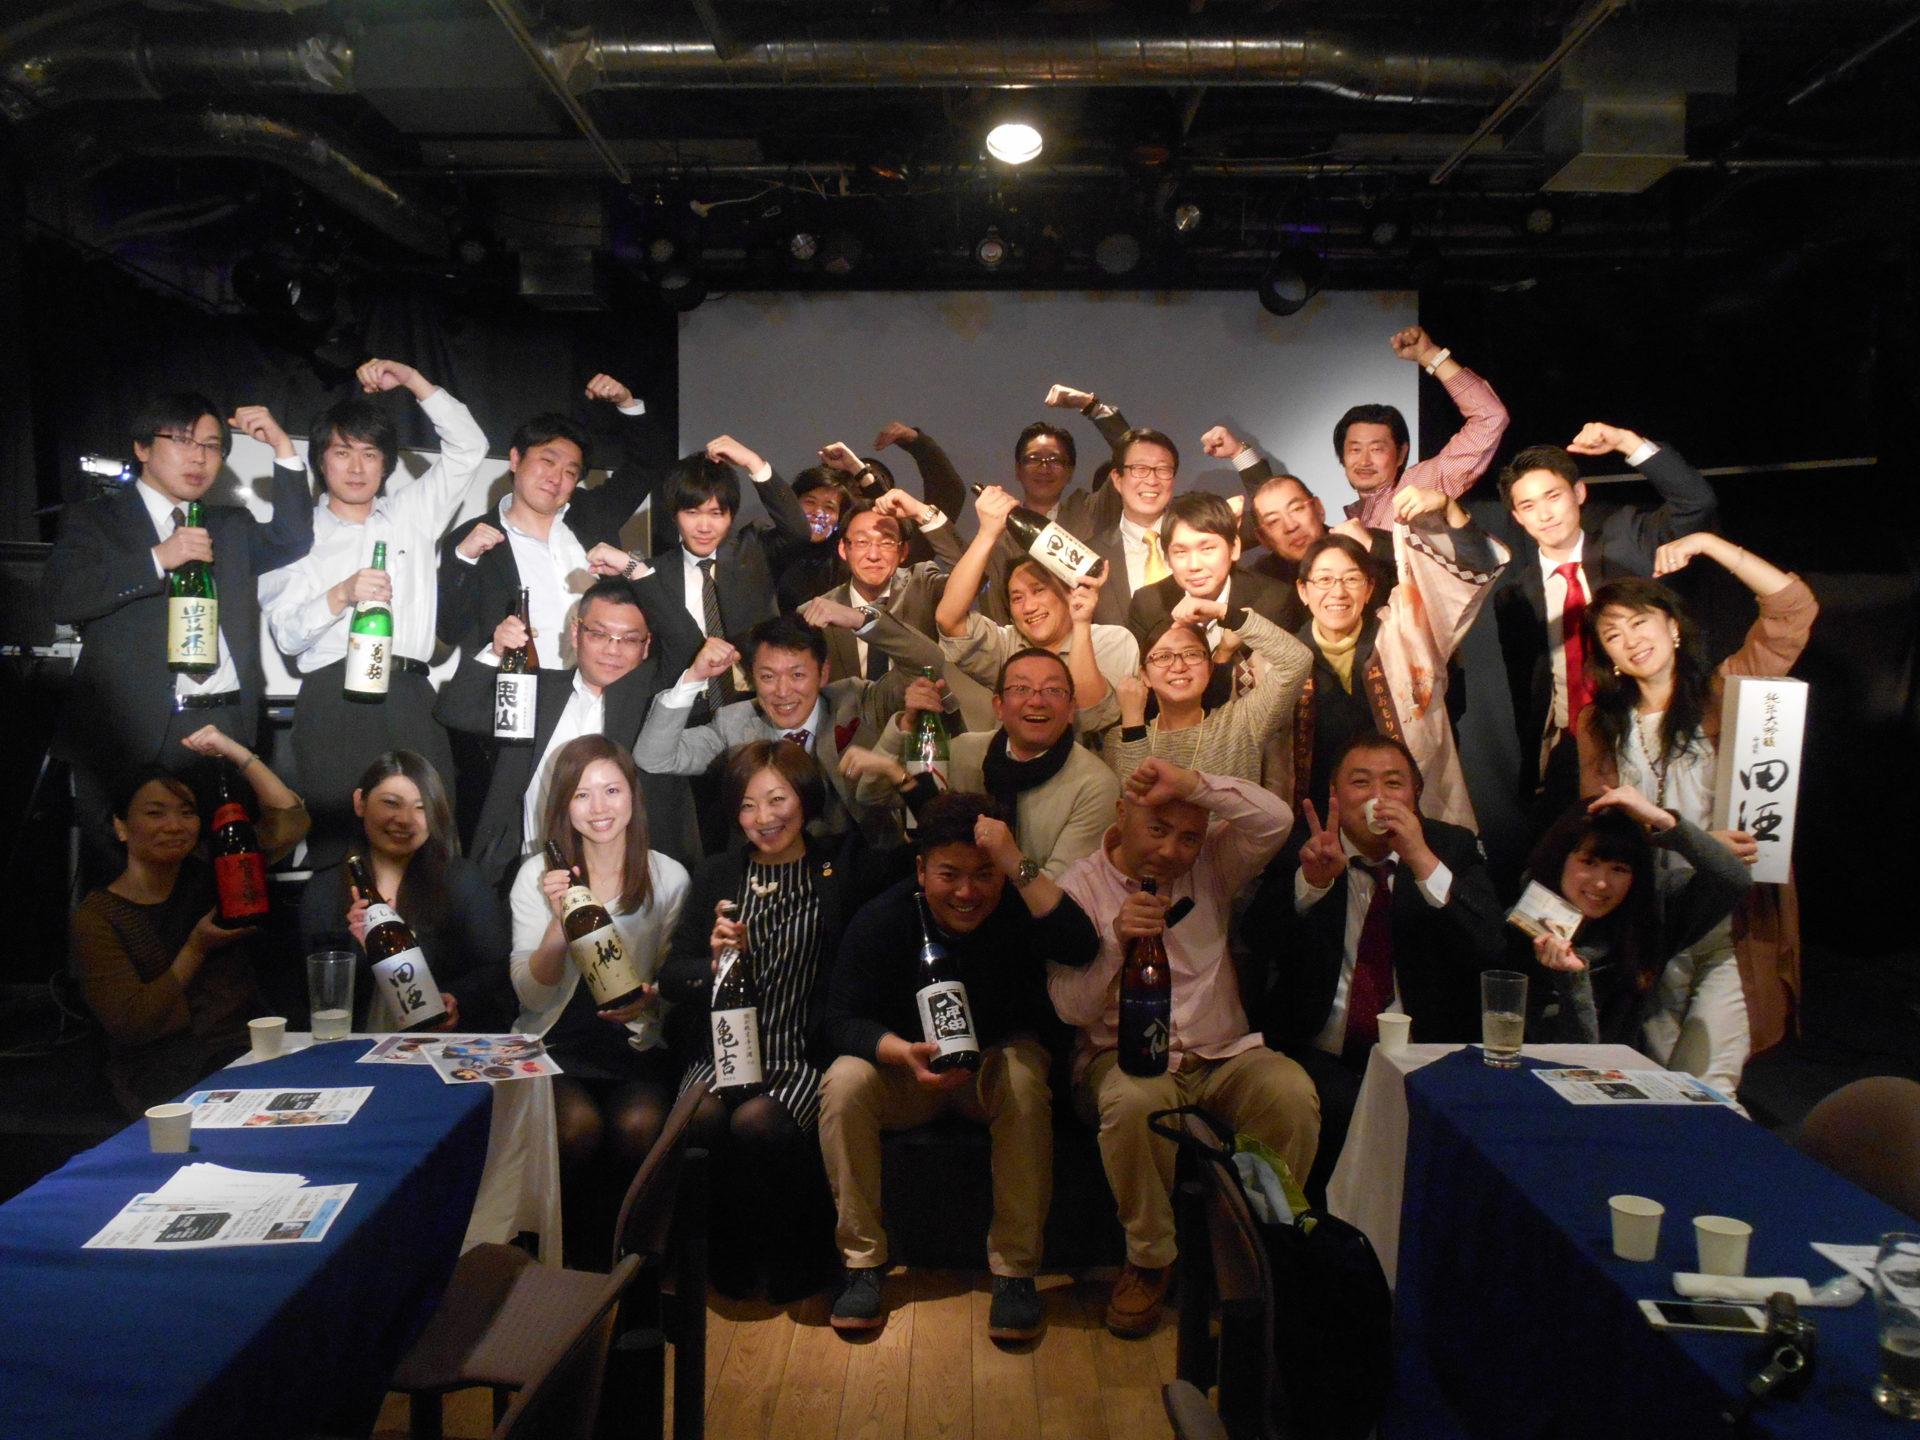 DSCN1101 1920x1440 - 2016年3月11日(金)AOsuki総会&パーティー開催しました。